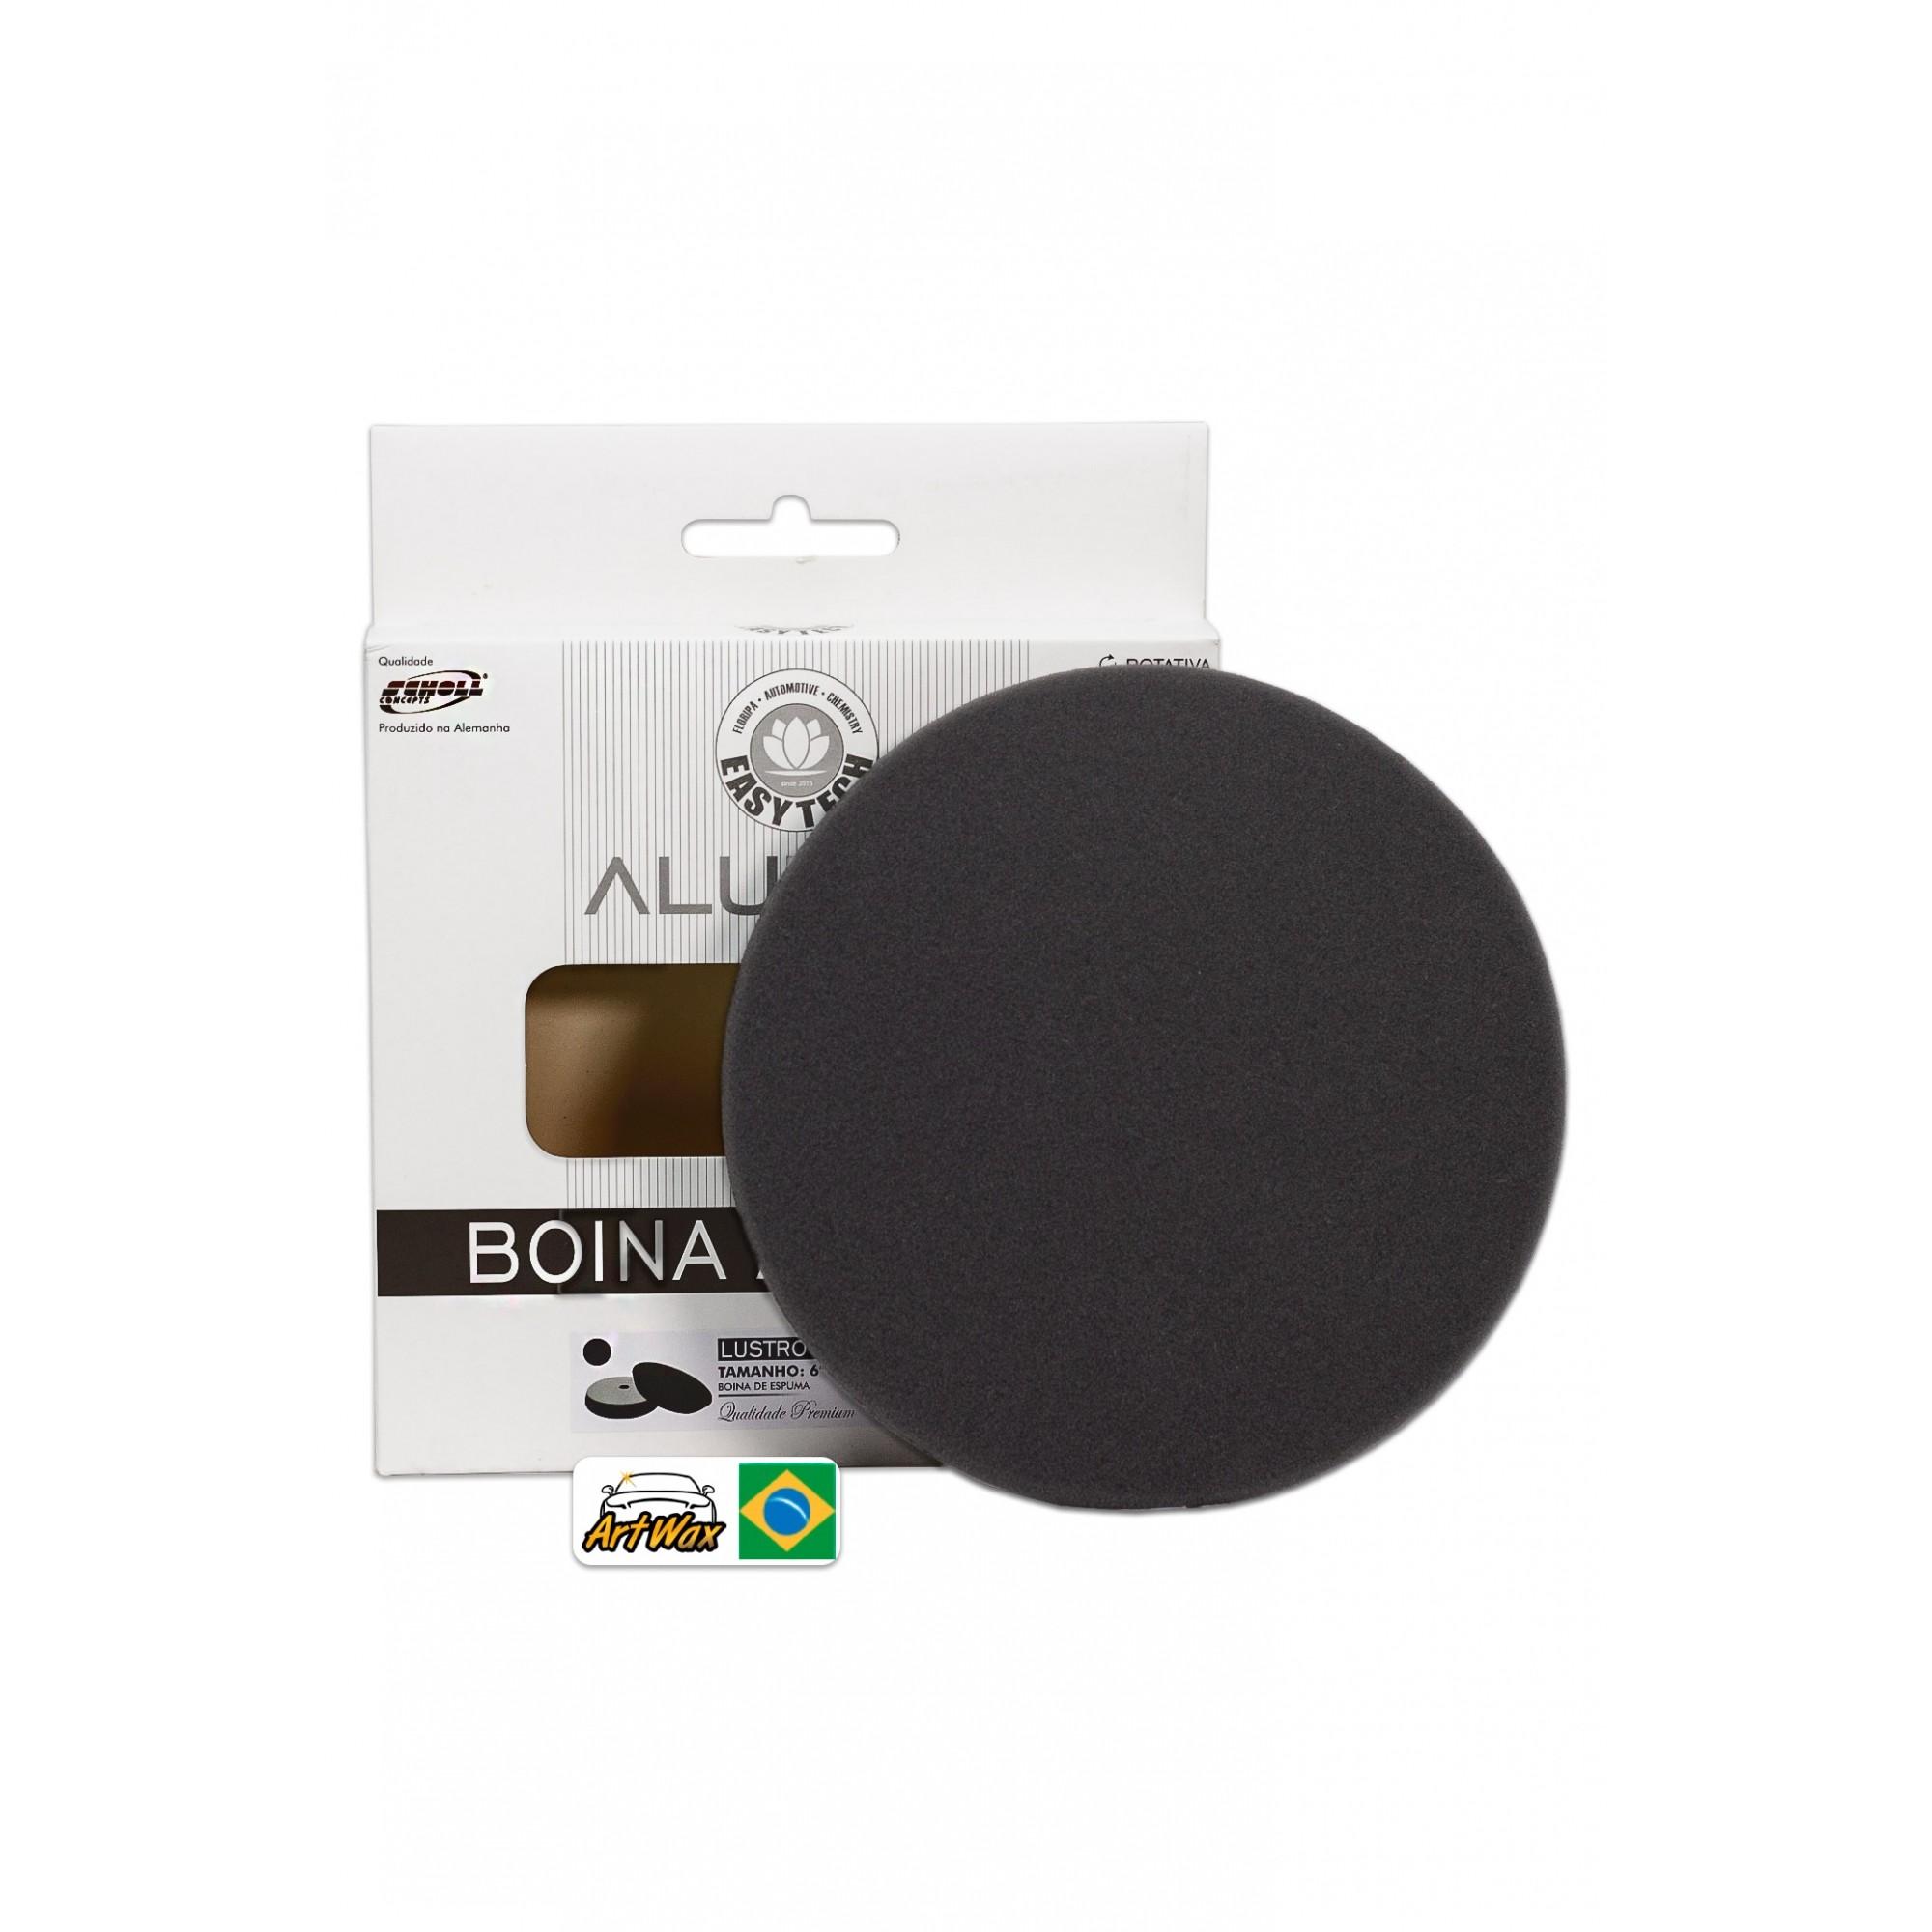 Easytech Boina Alumina Lustro 165mm 6